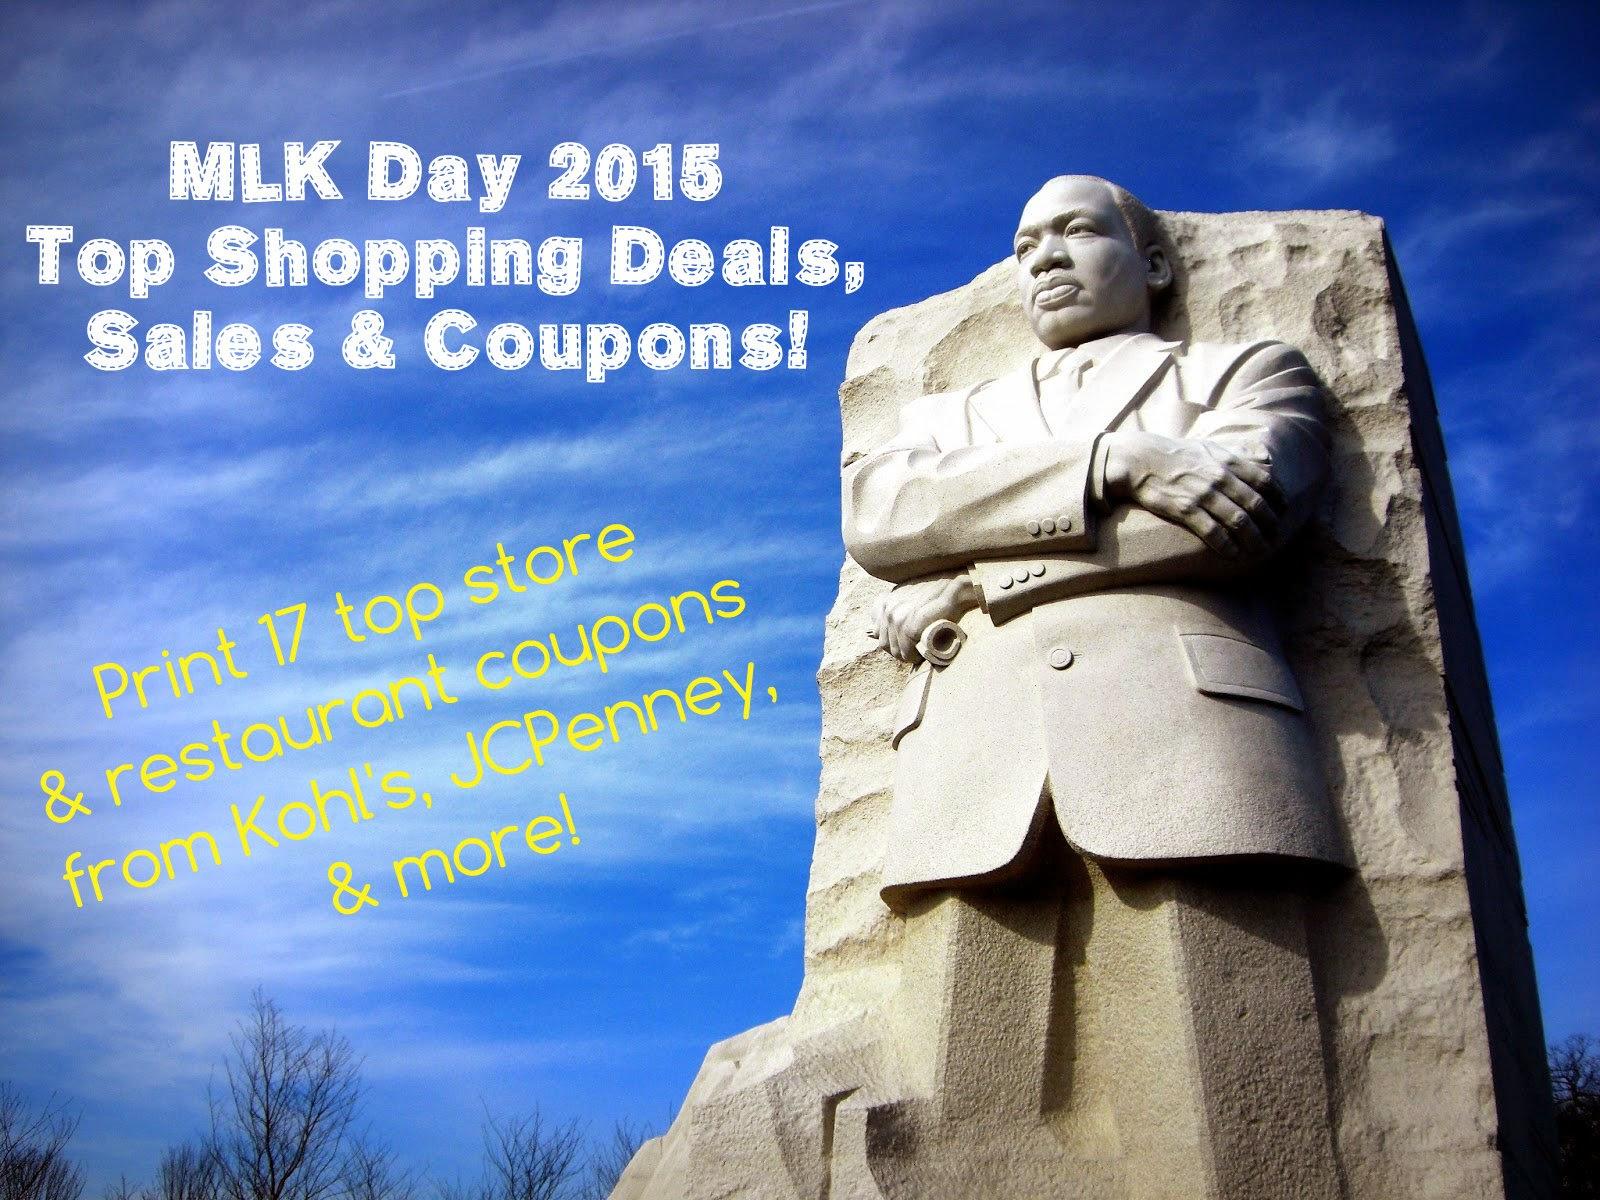 Mlk day travel deals